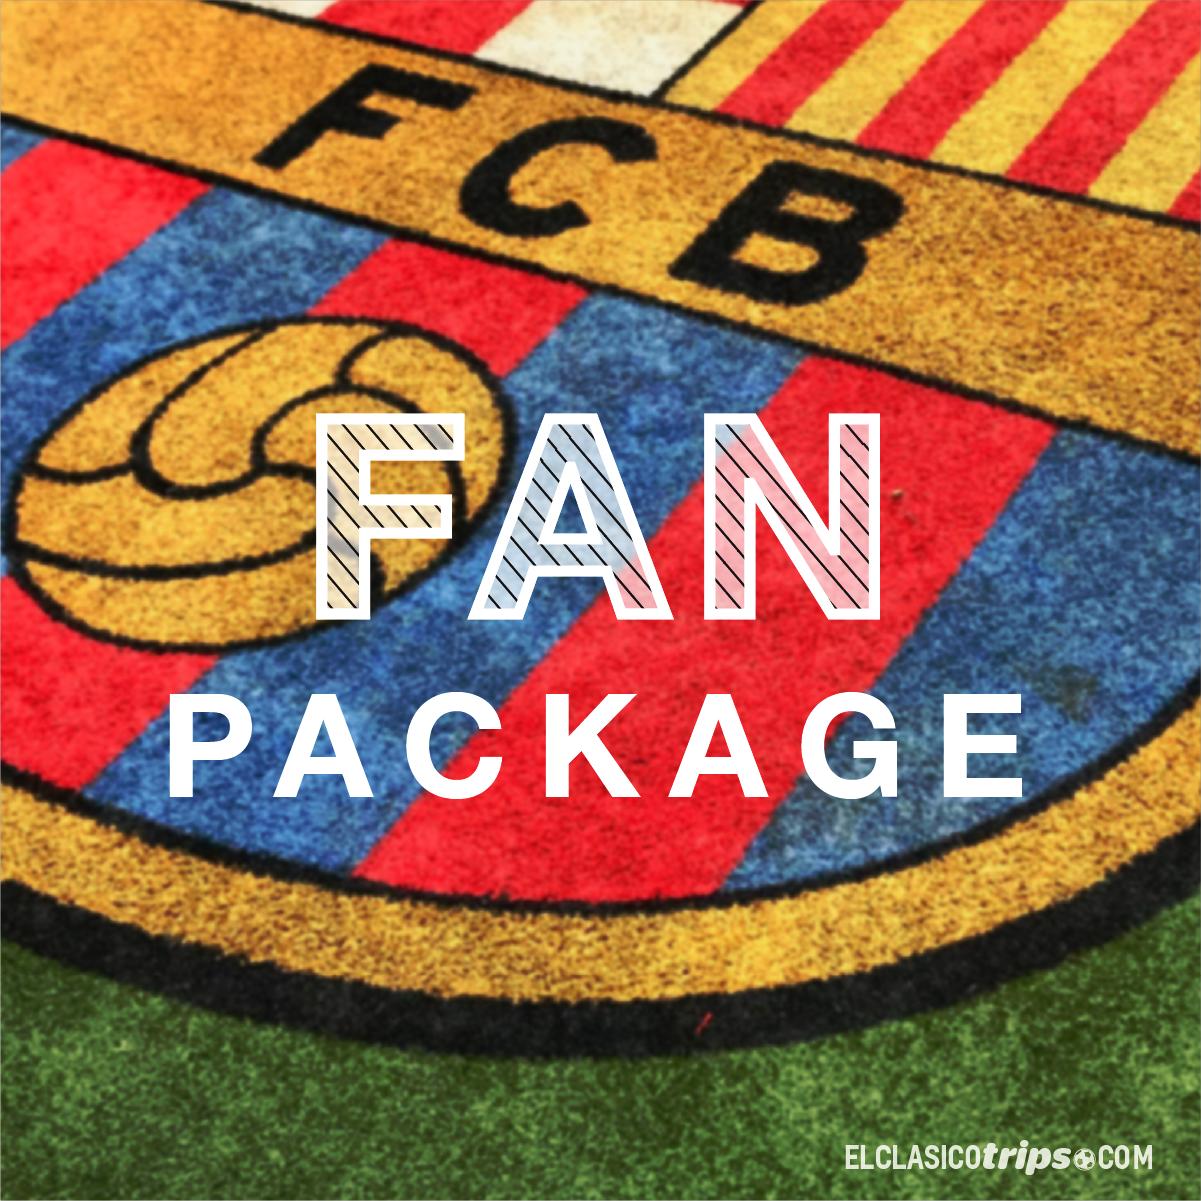 El Clasico 2019 Tickets Fc Barcelona Vs Real Madrid At